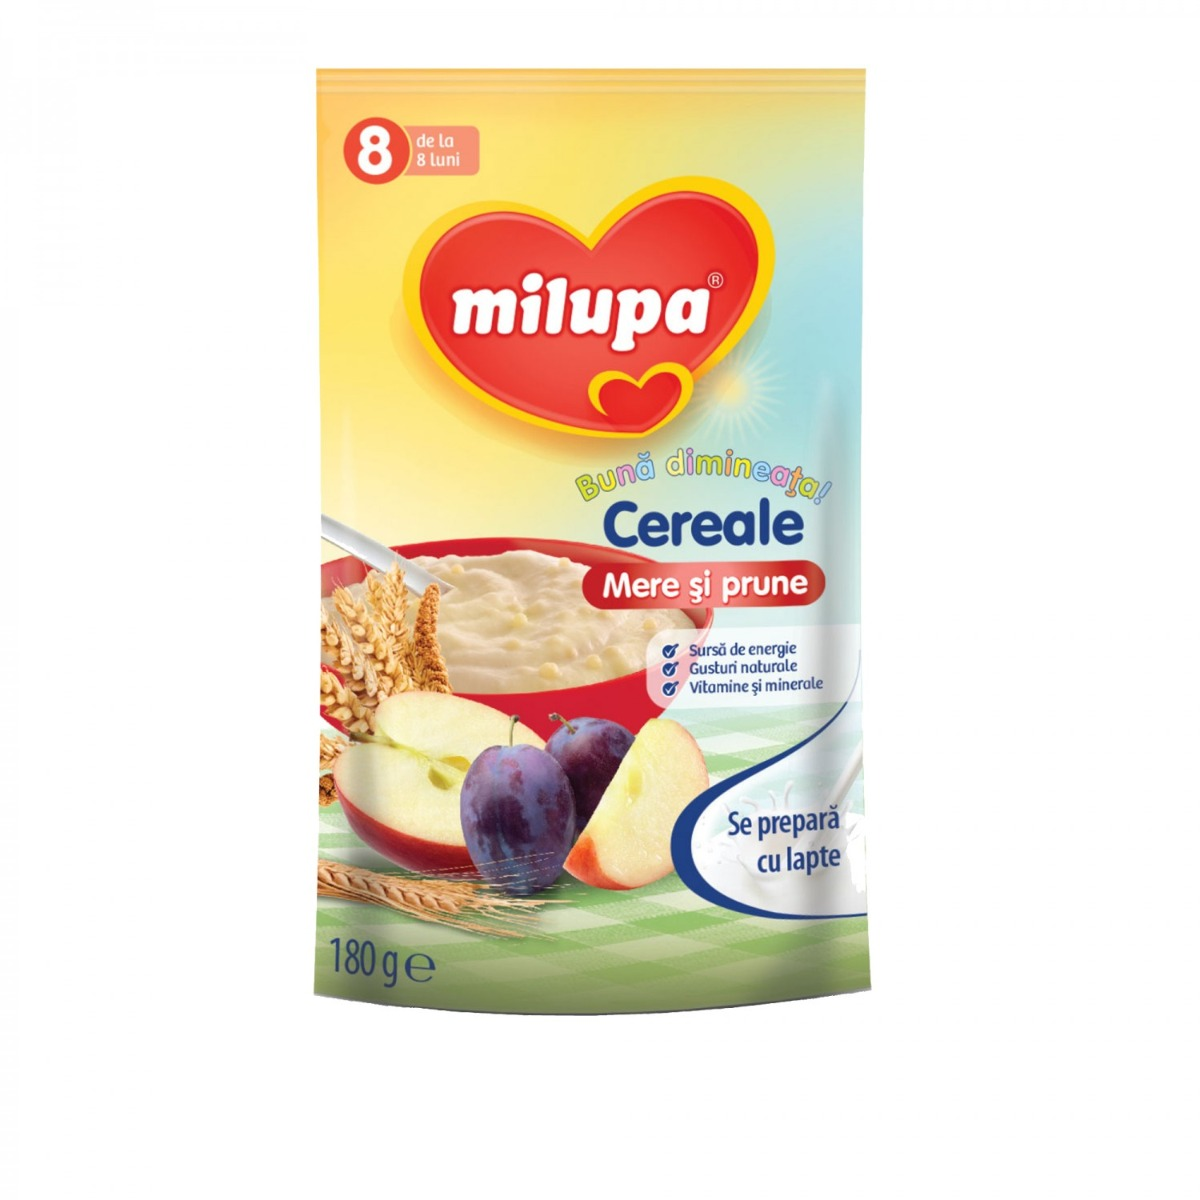 Cereale fara lapte Milupa Buna dimineata, Mere si Prune, 180g, 8 luni+